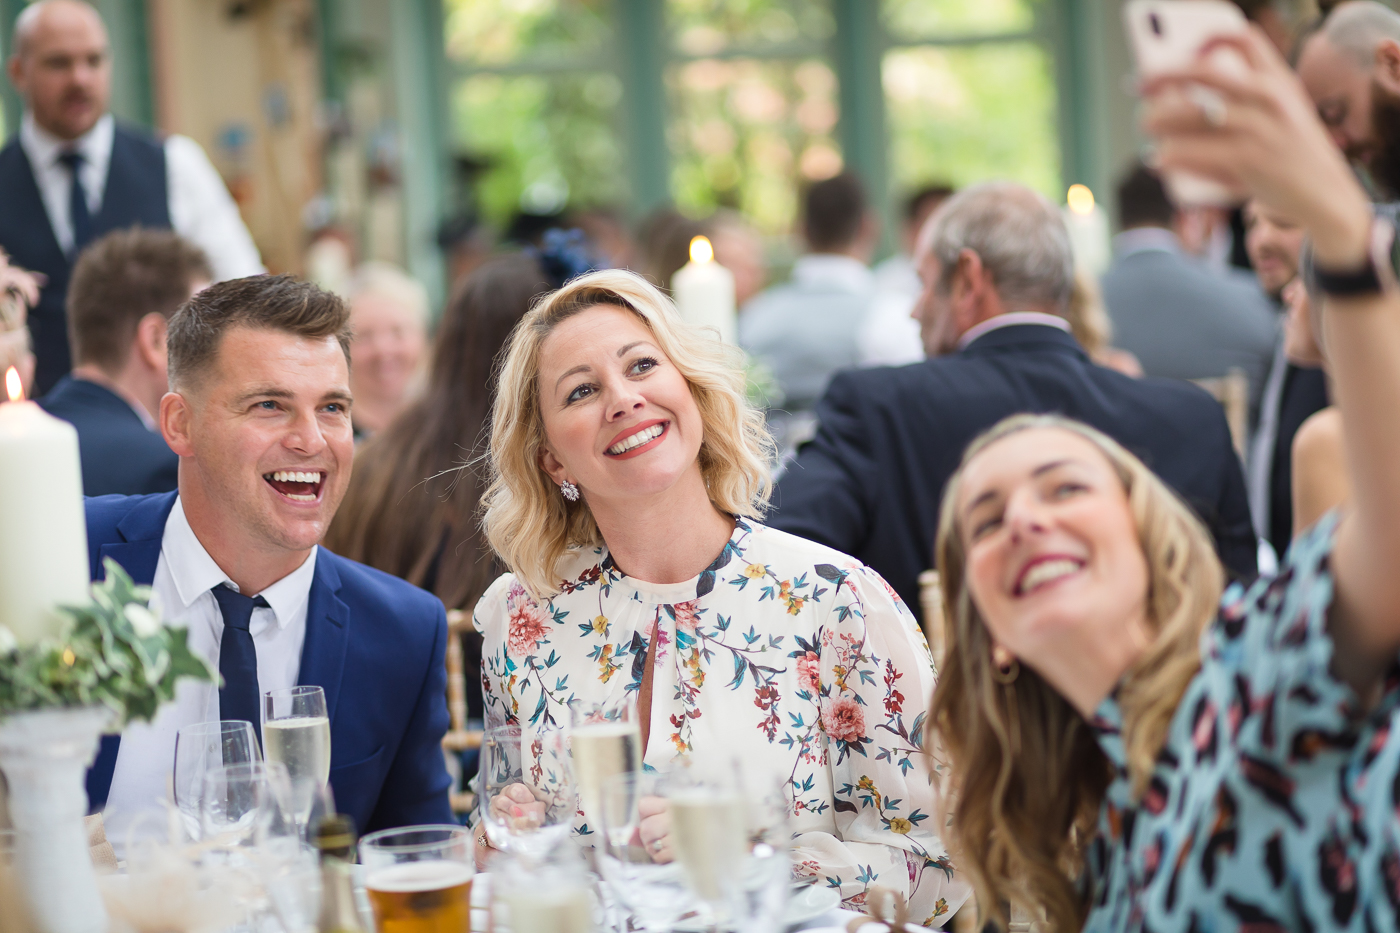 Sun pavilion harrogate Amanda Manby wedding photographer